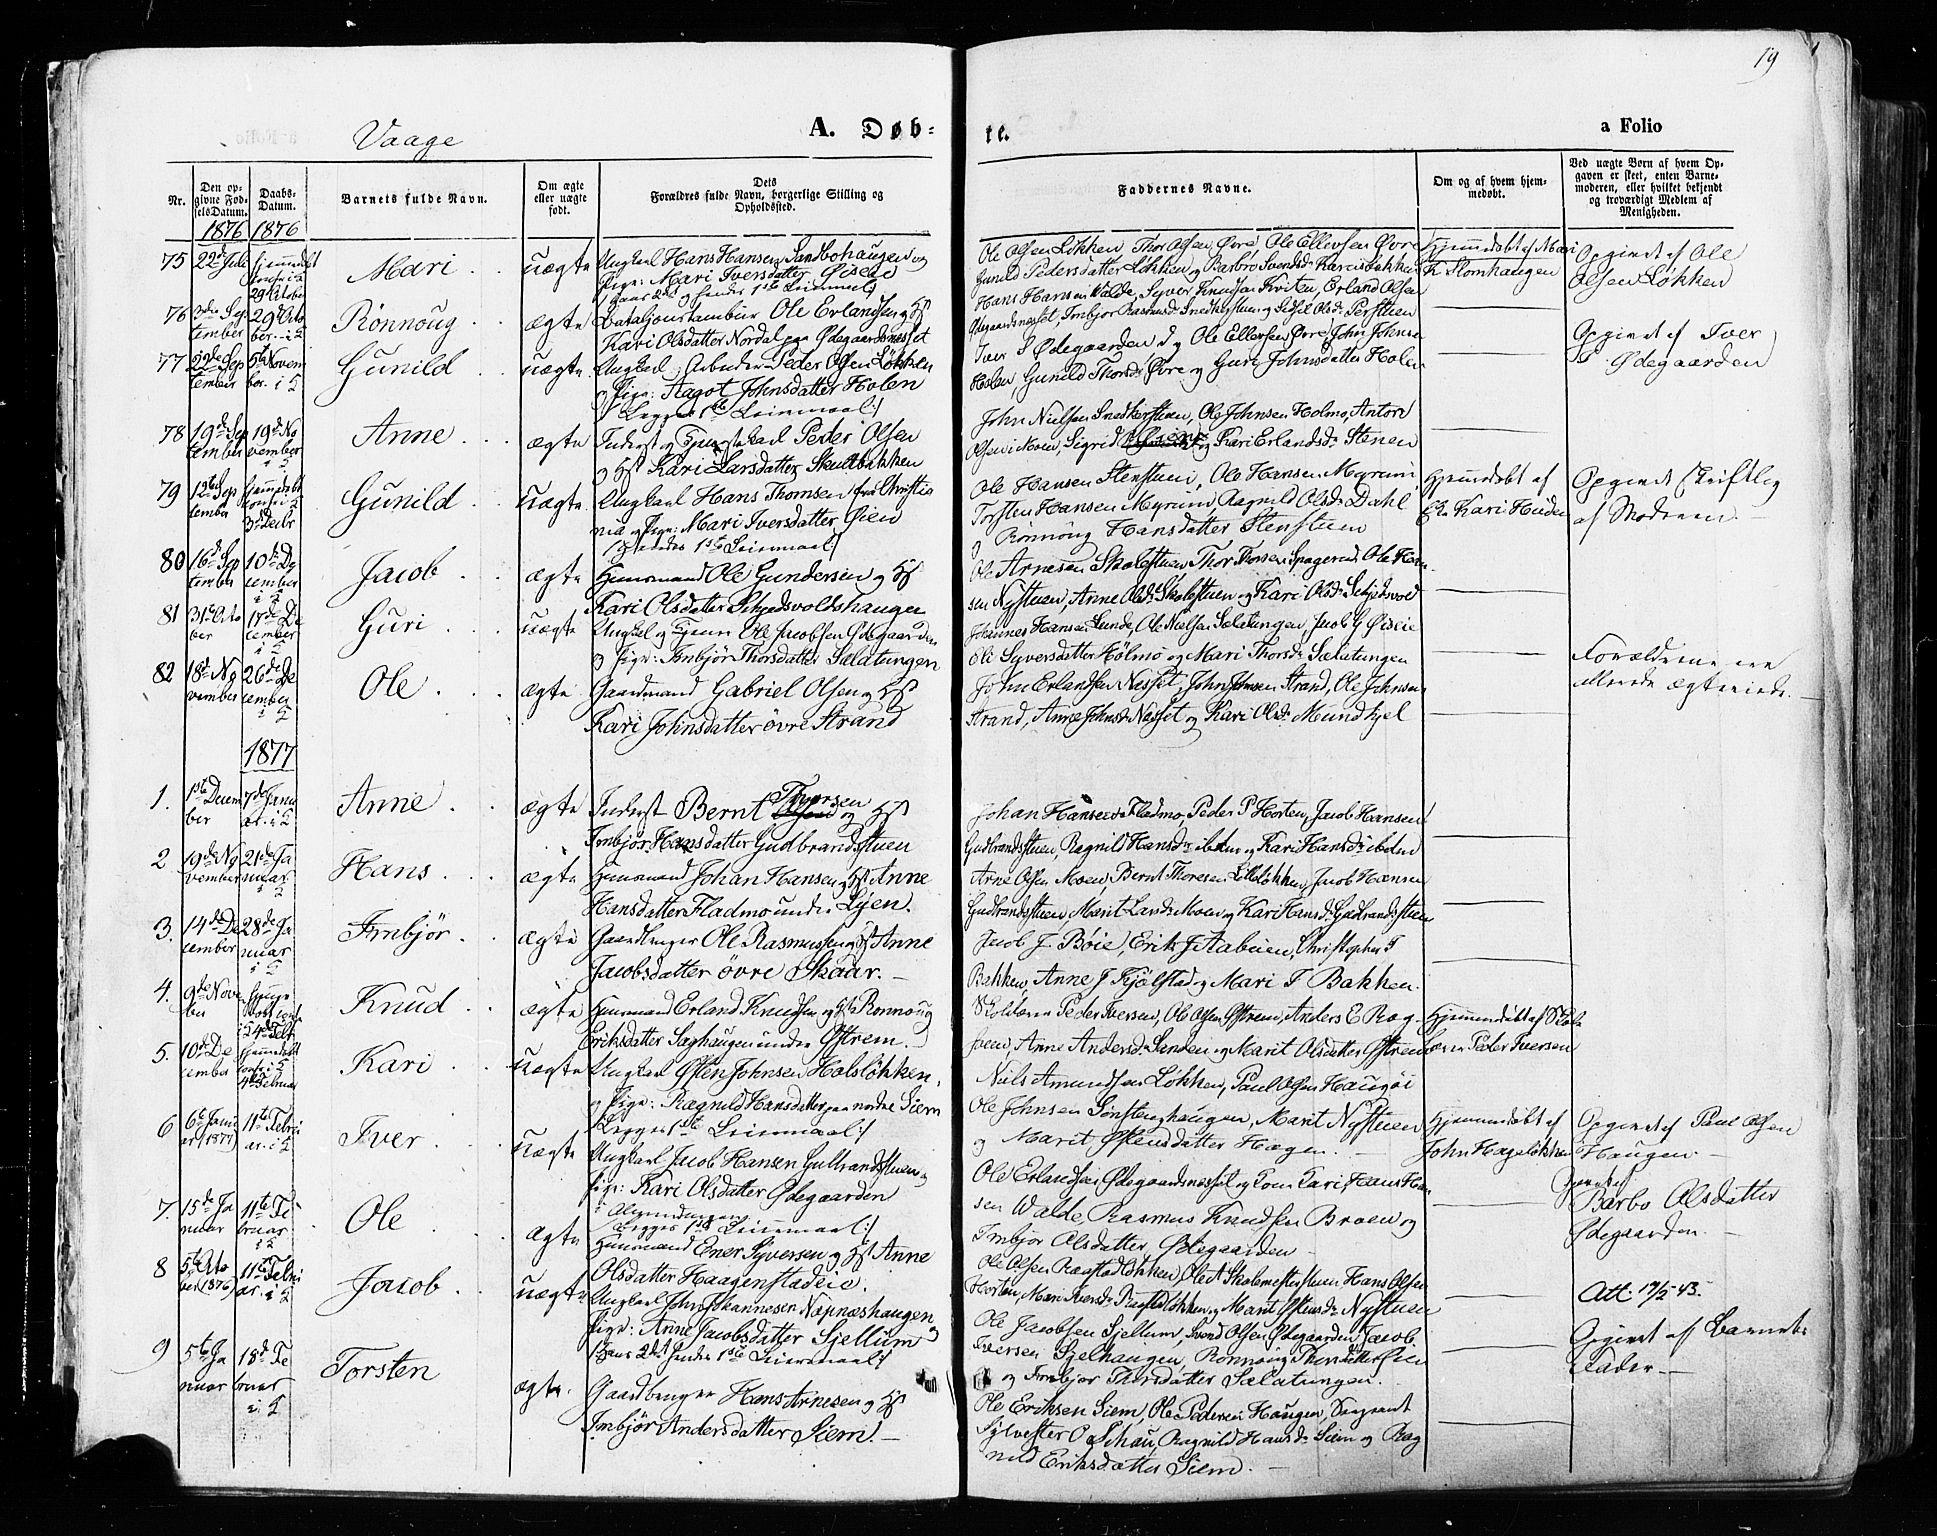 SAH, Vågå prestekontor, Ministerialbok nr. 7 /1, 1872-1886, s. 19